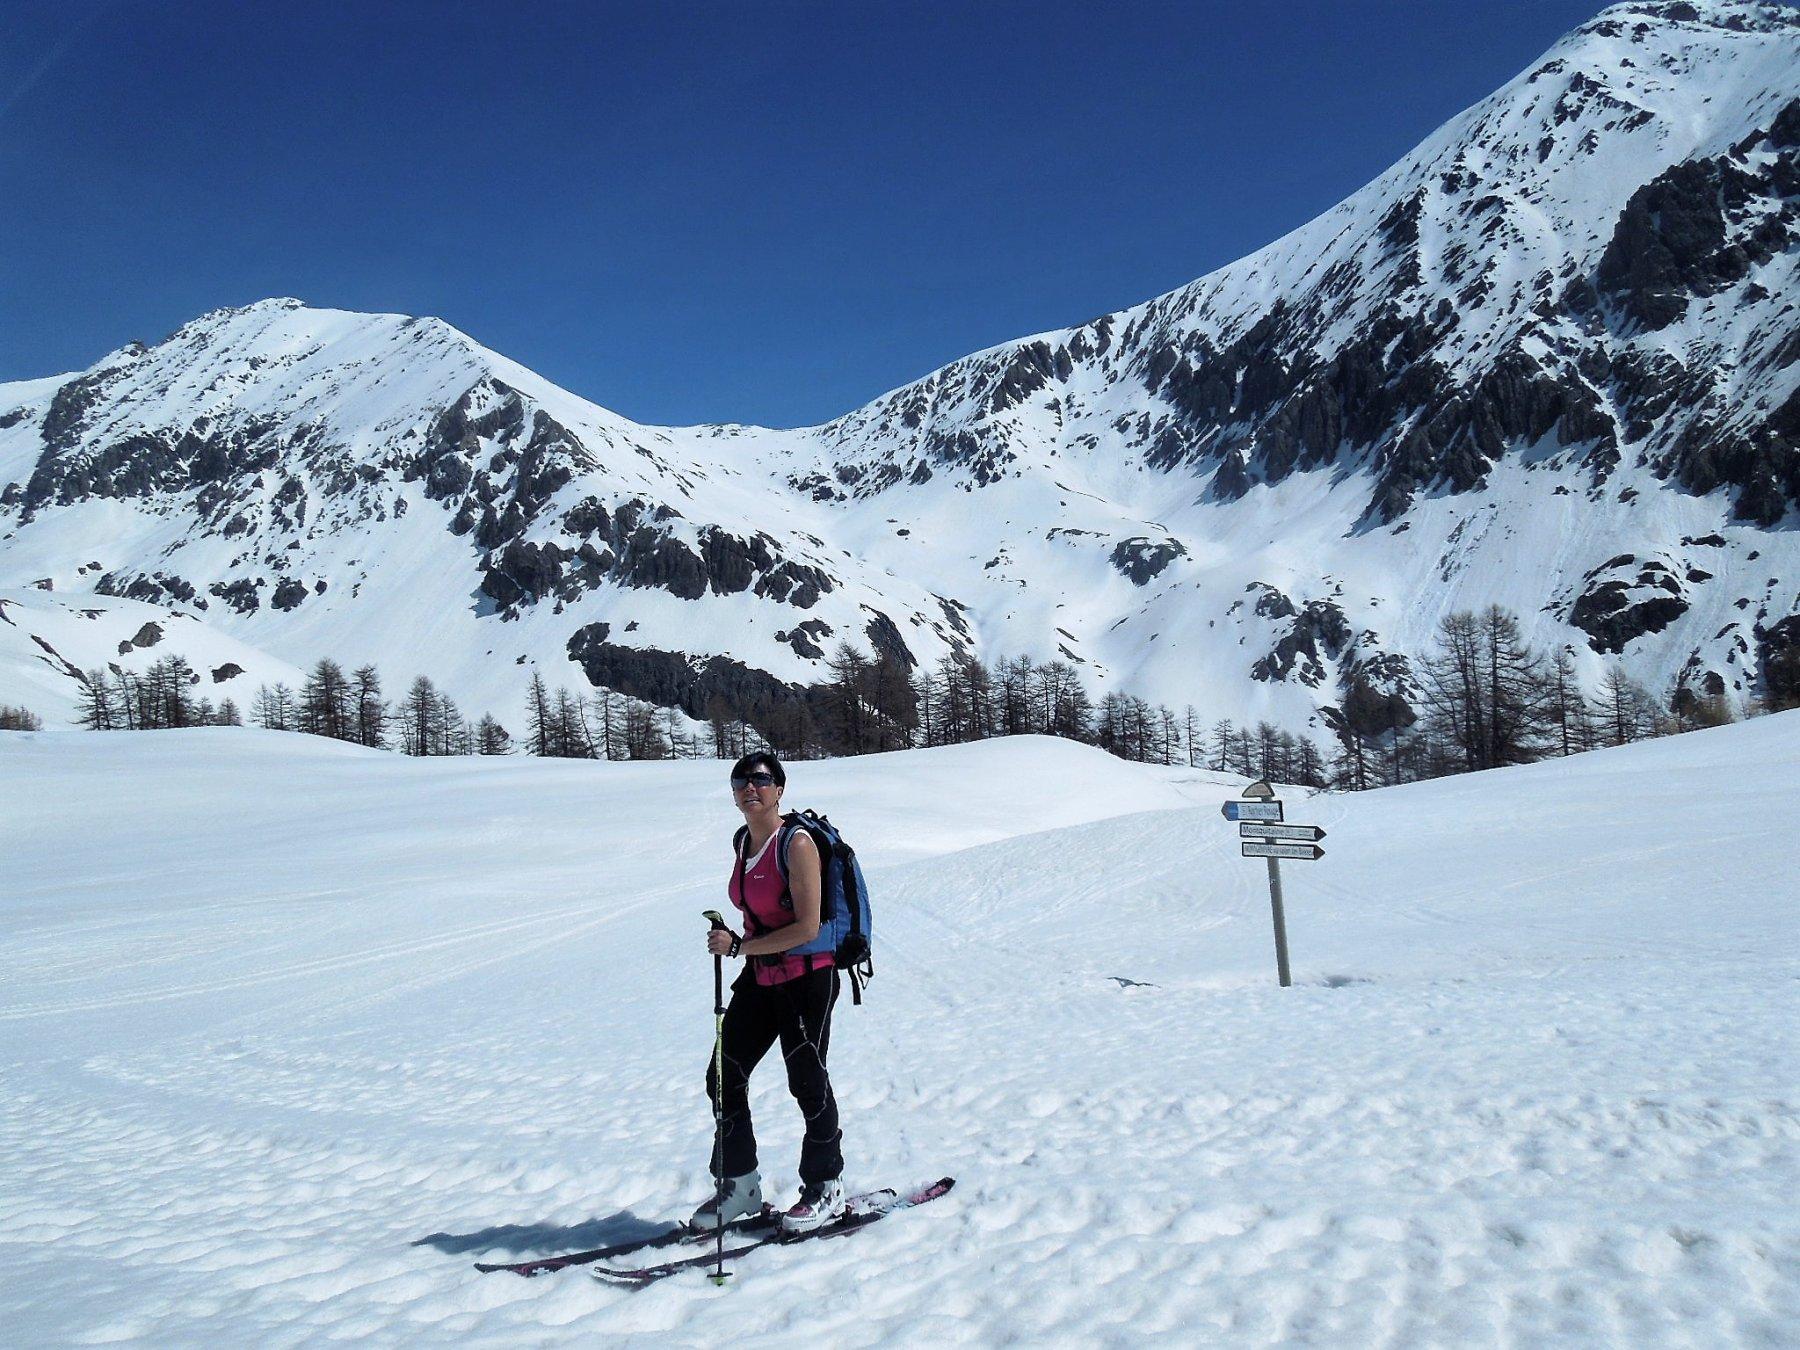 Ultima risalita all'Alpet